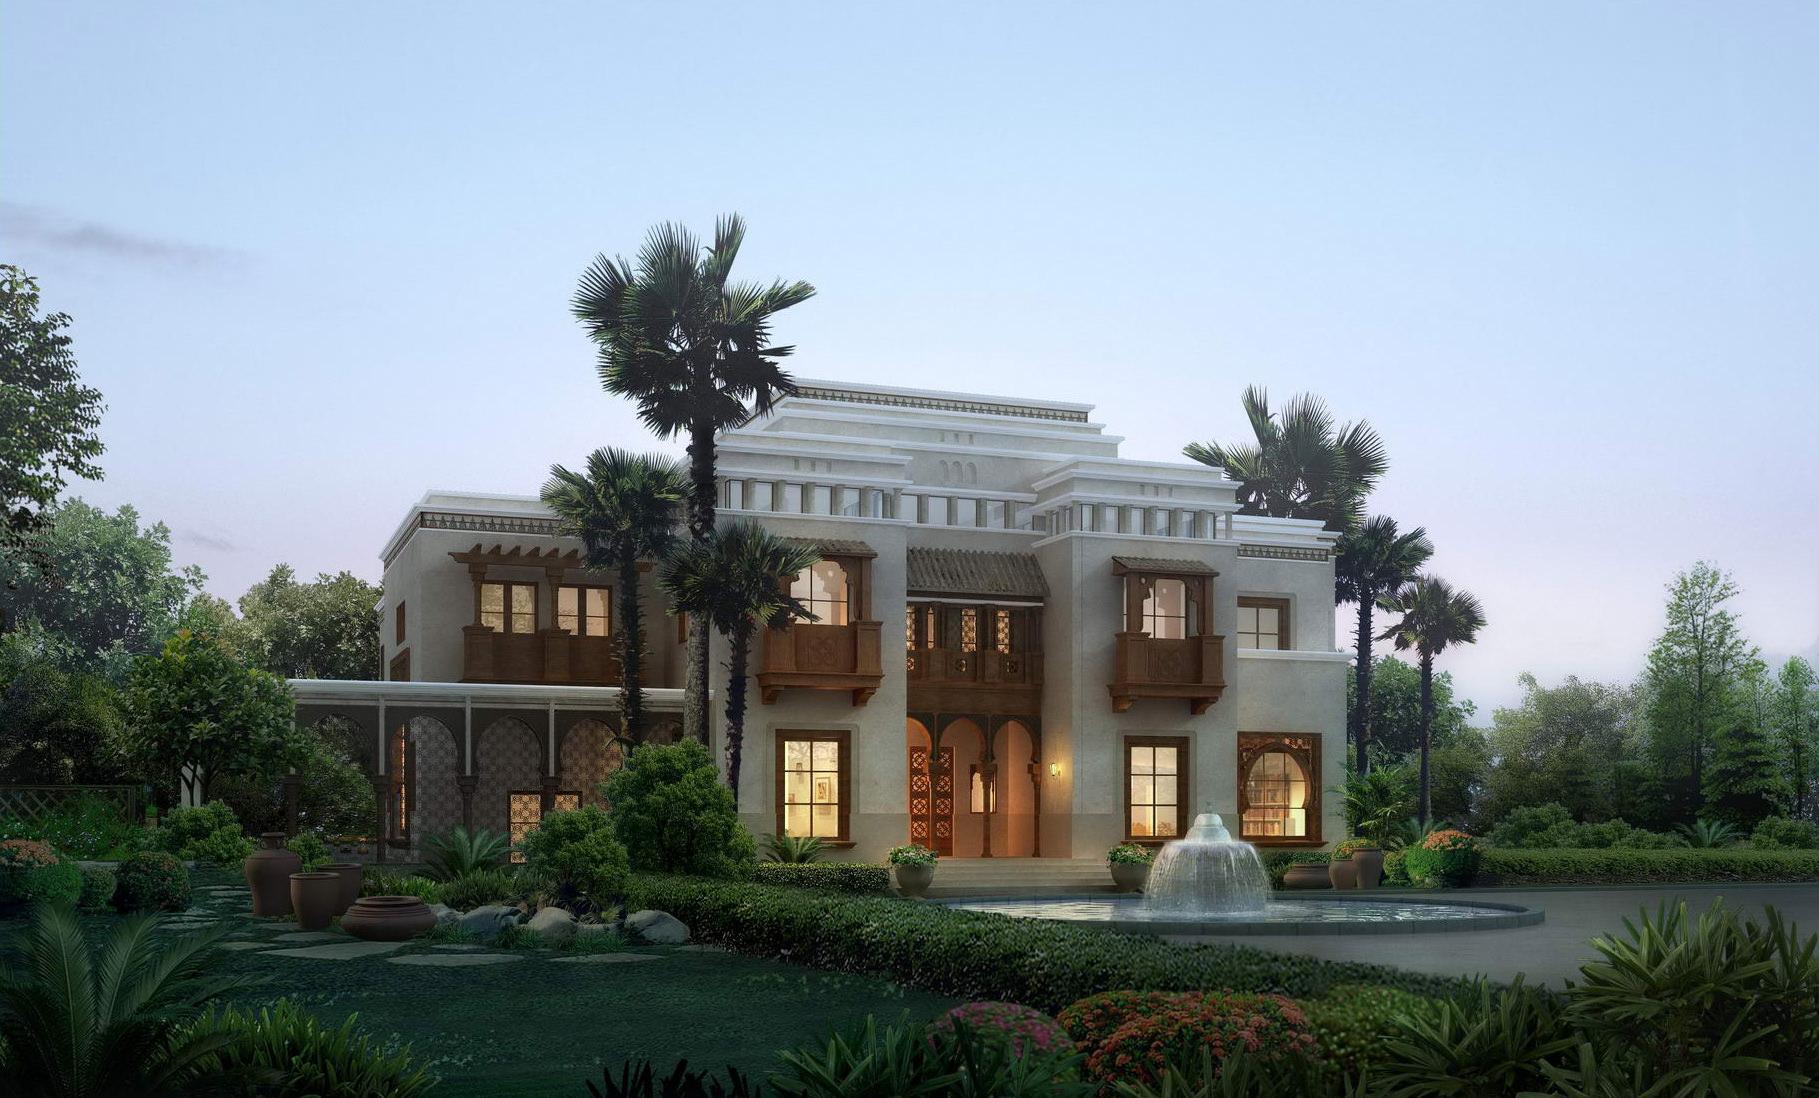 Luxury Villa with Palm Tree | 3D model